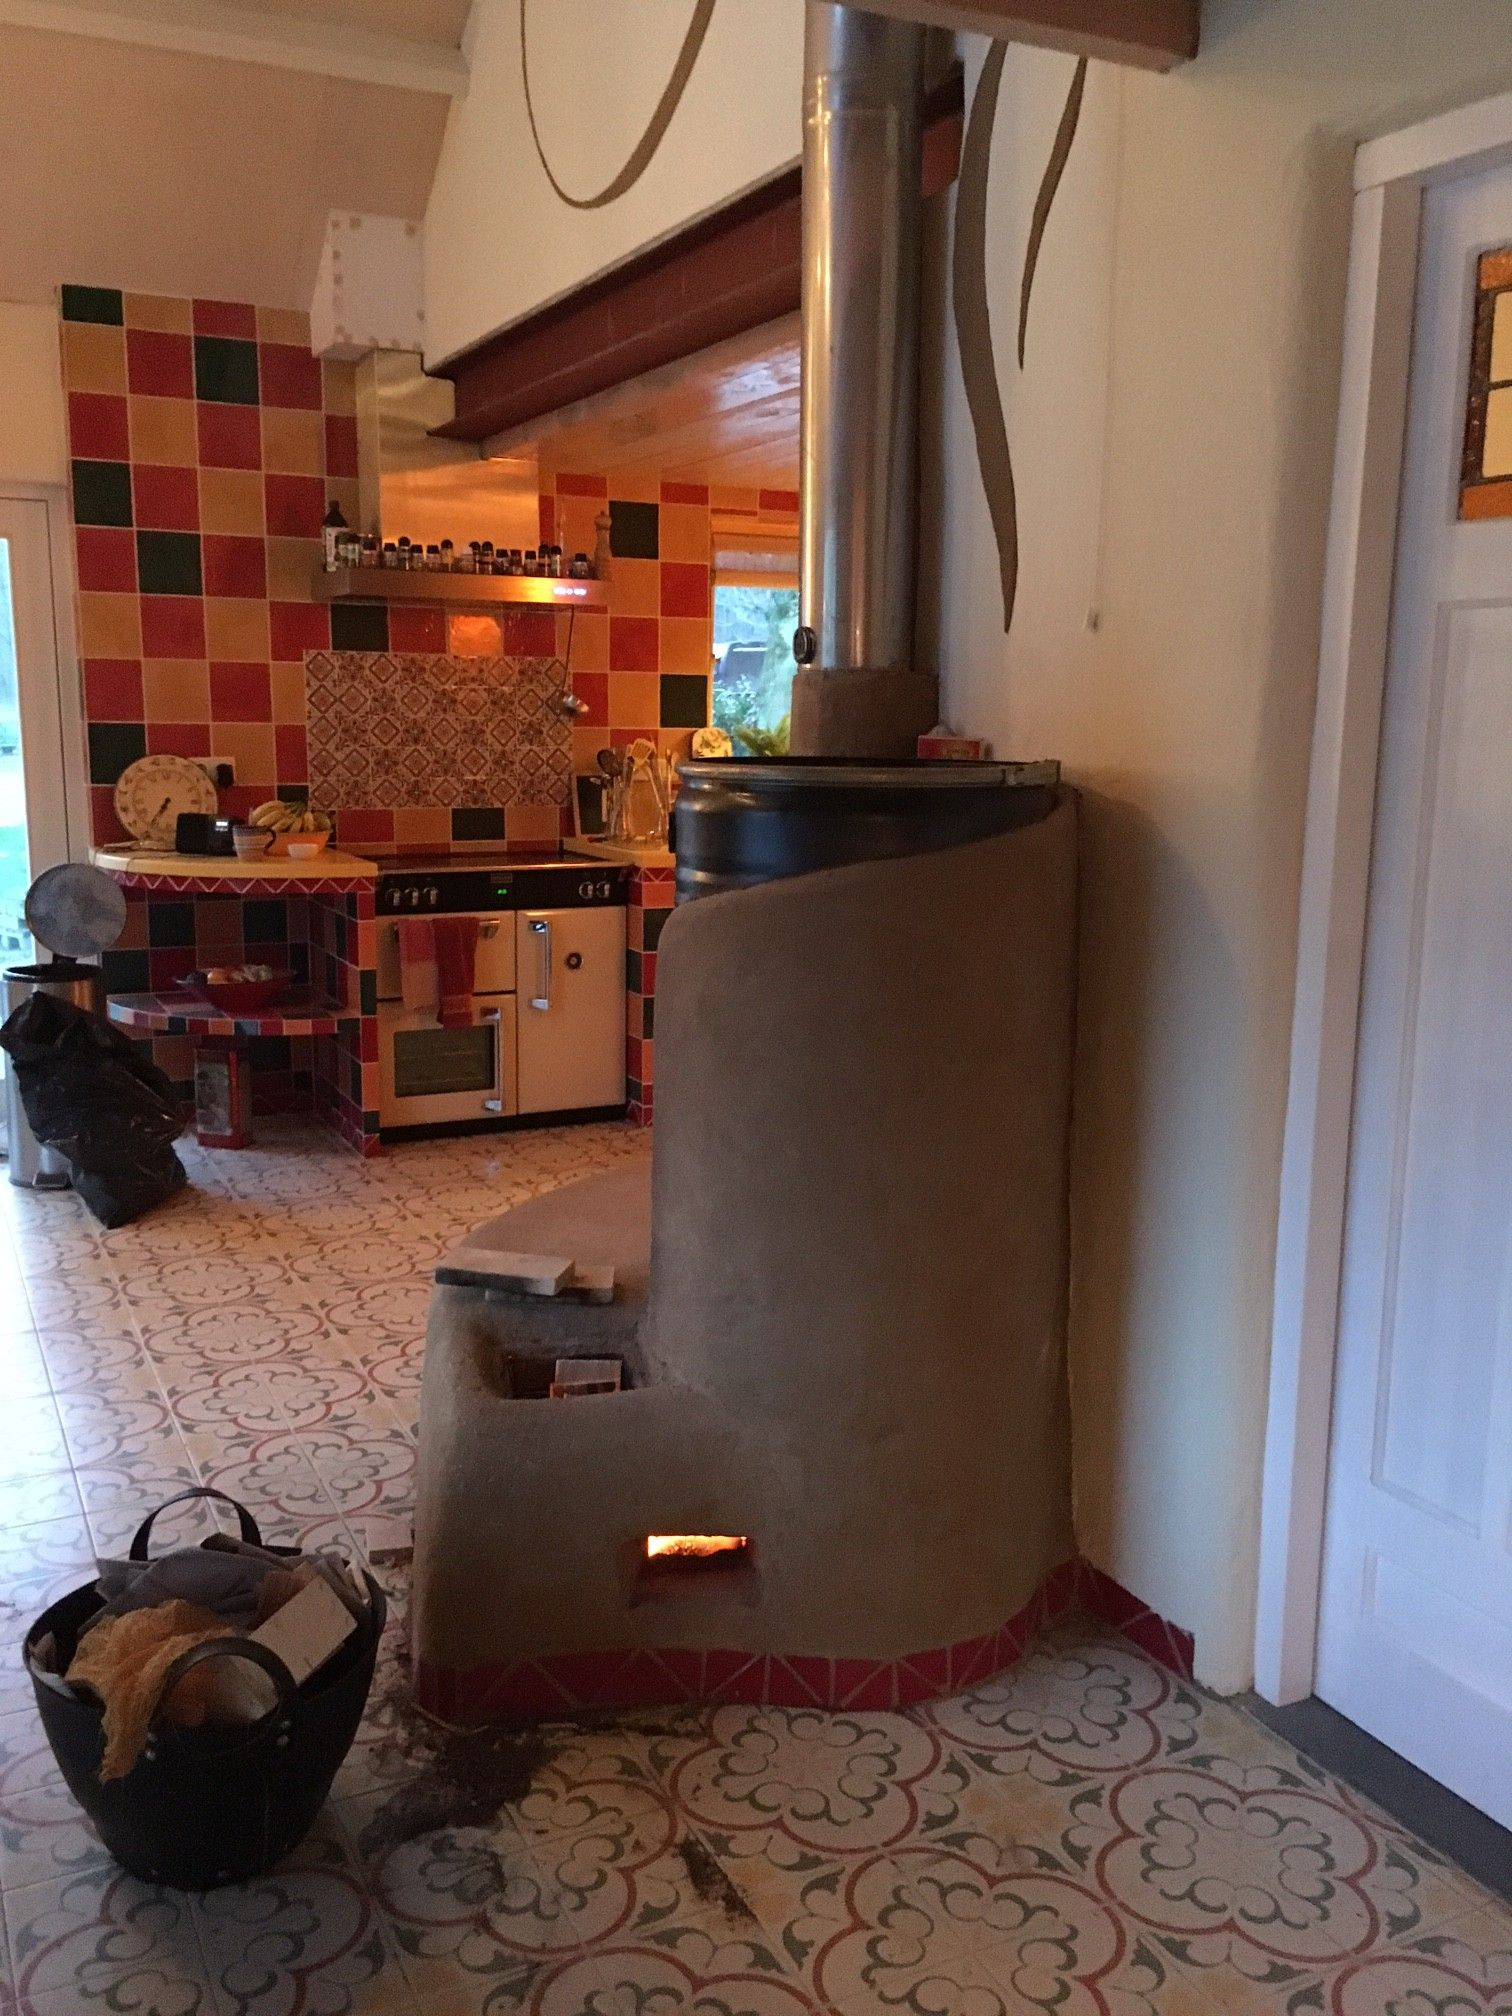 4 rocket masonry heater castle build kit stove cast iron stove